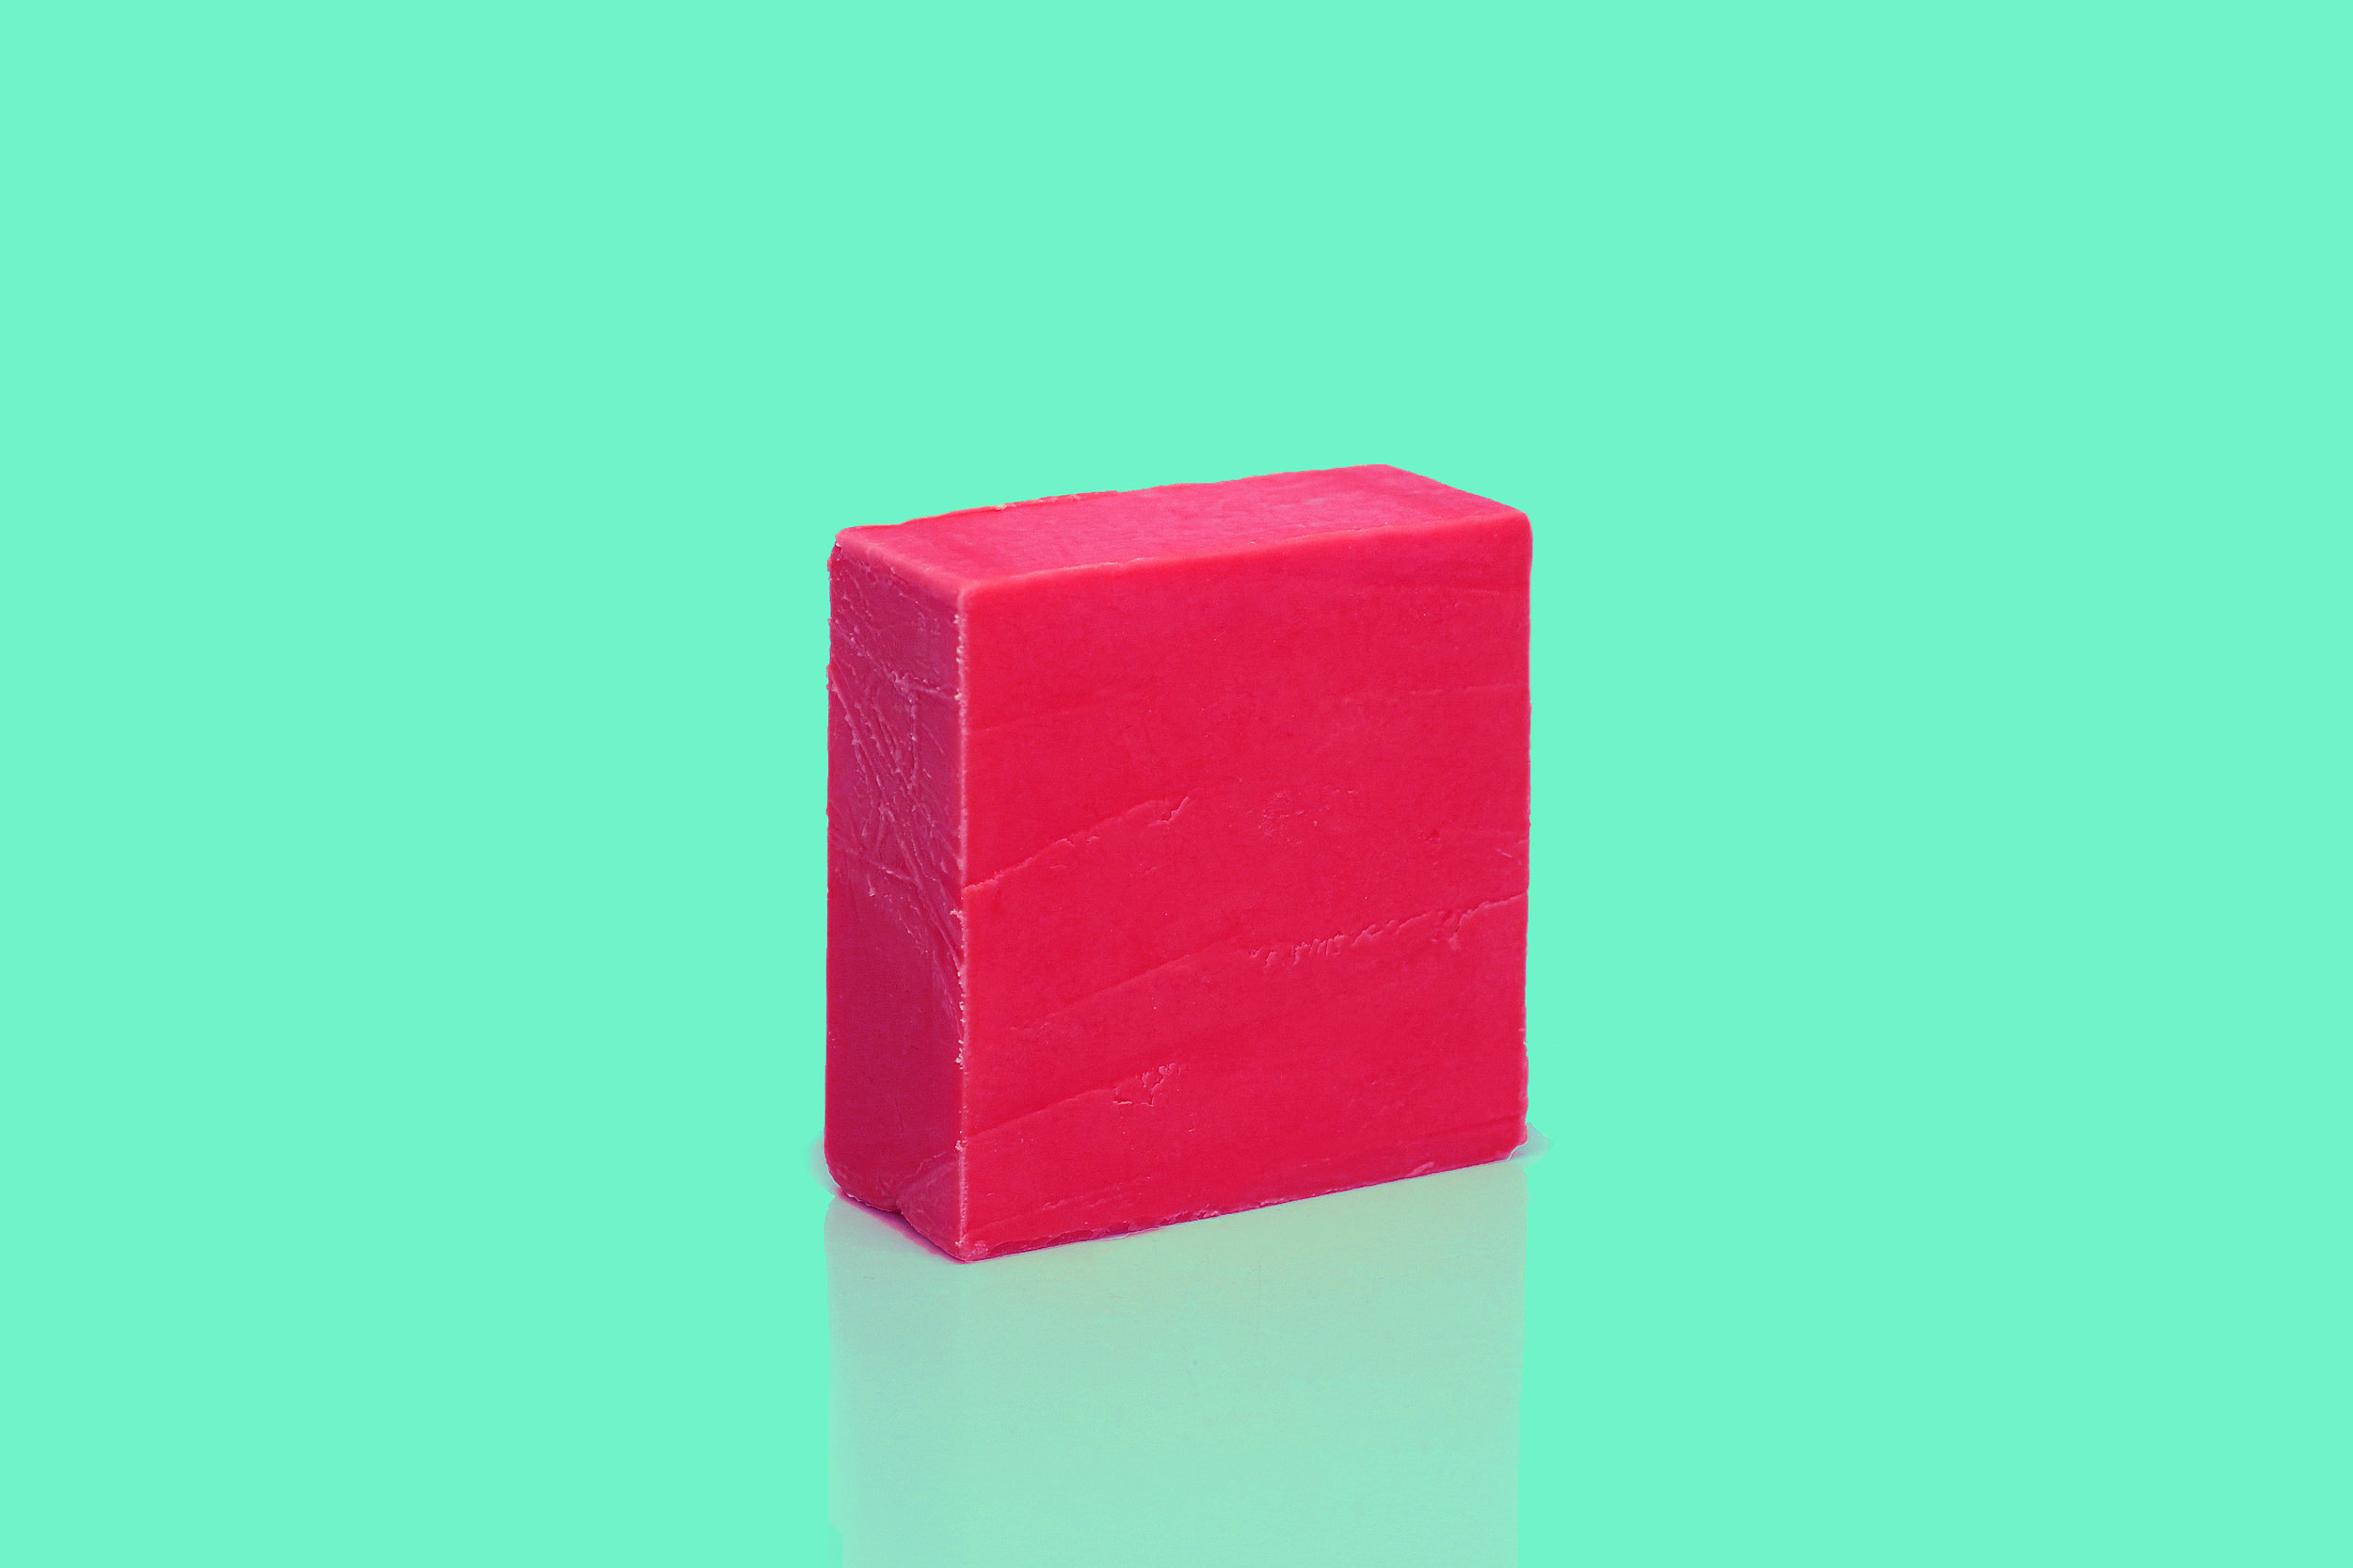 PINK-CHEDDAR.jpg